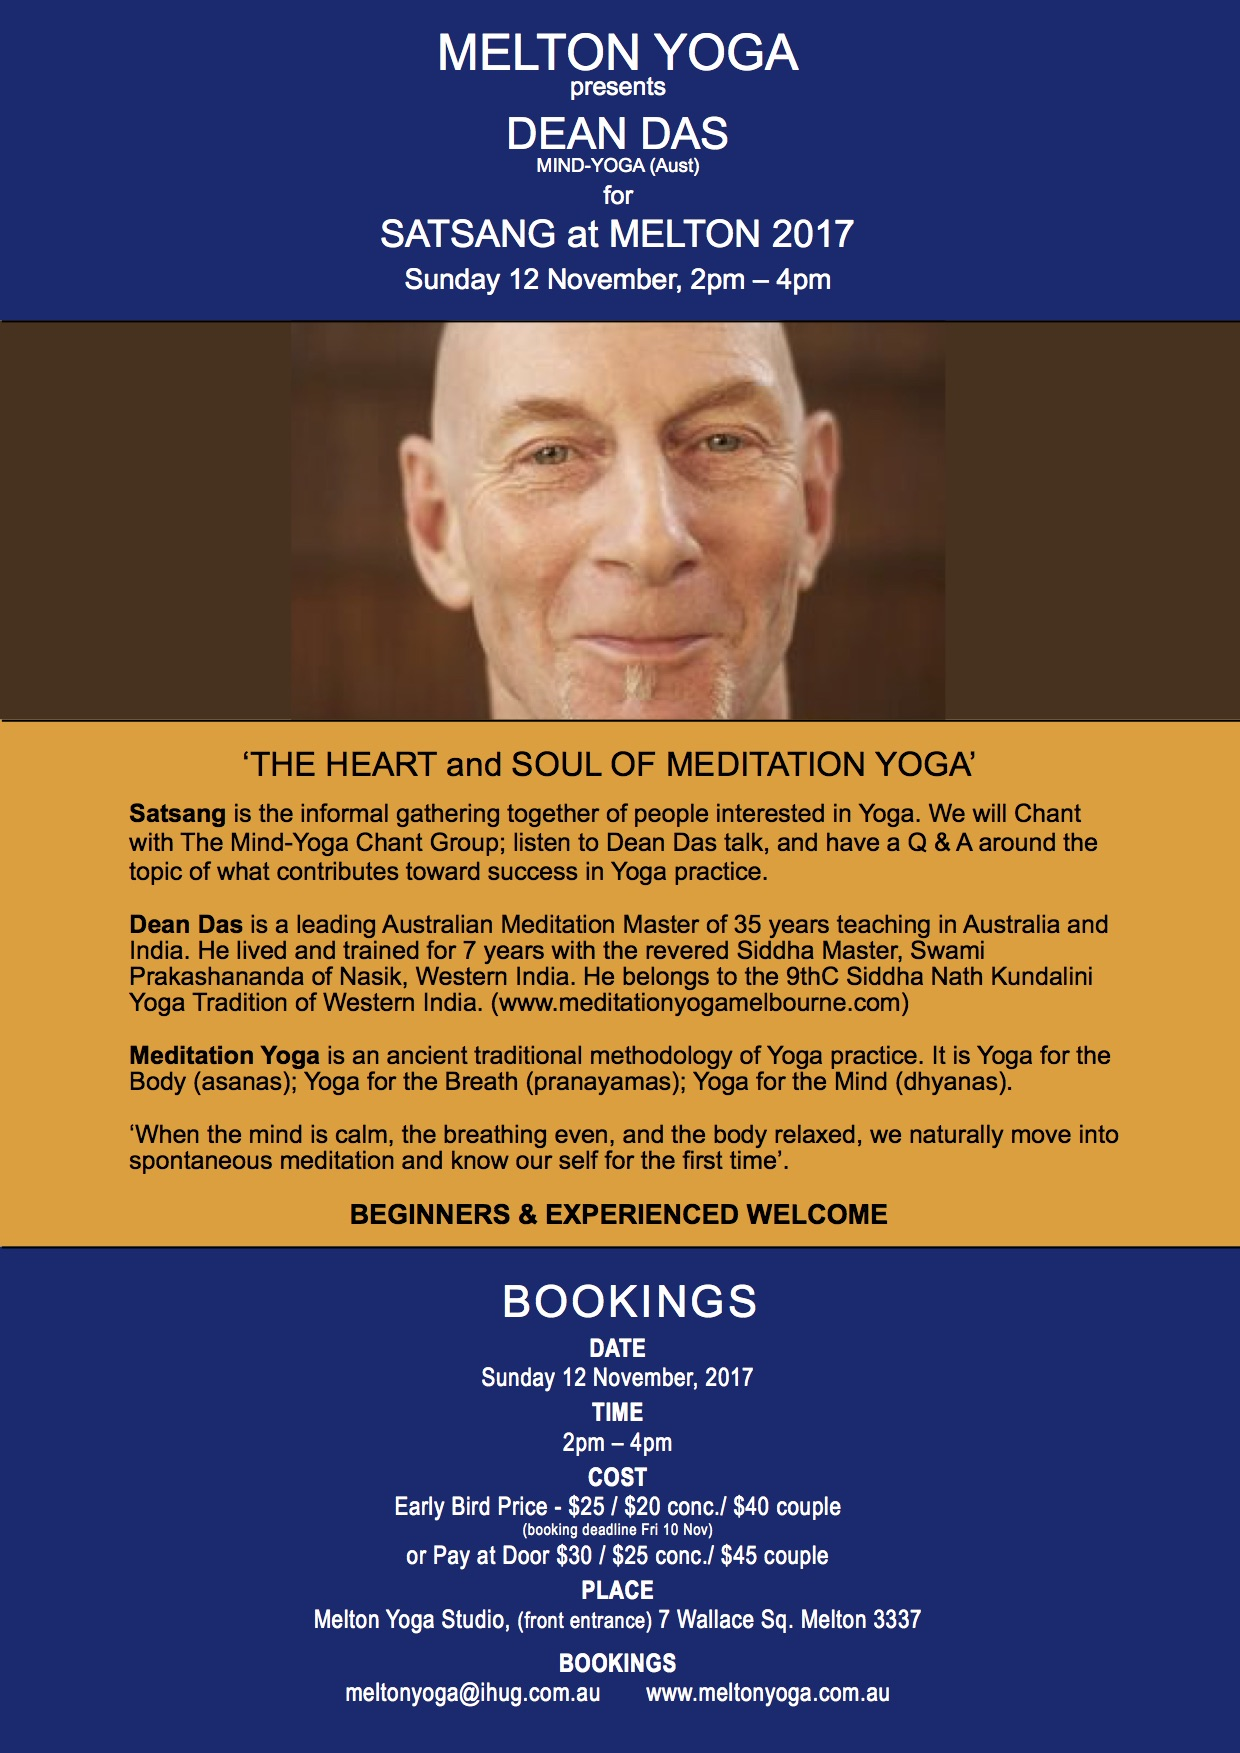 Melton Yoga Satsang A4 Nov 2017 A4.jpg